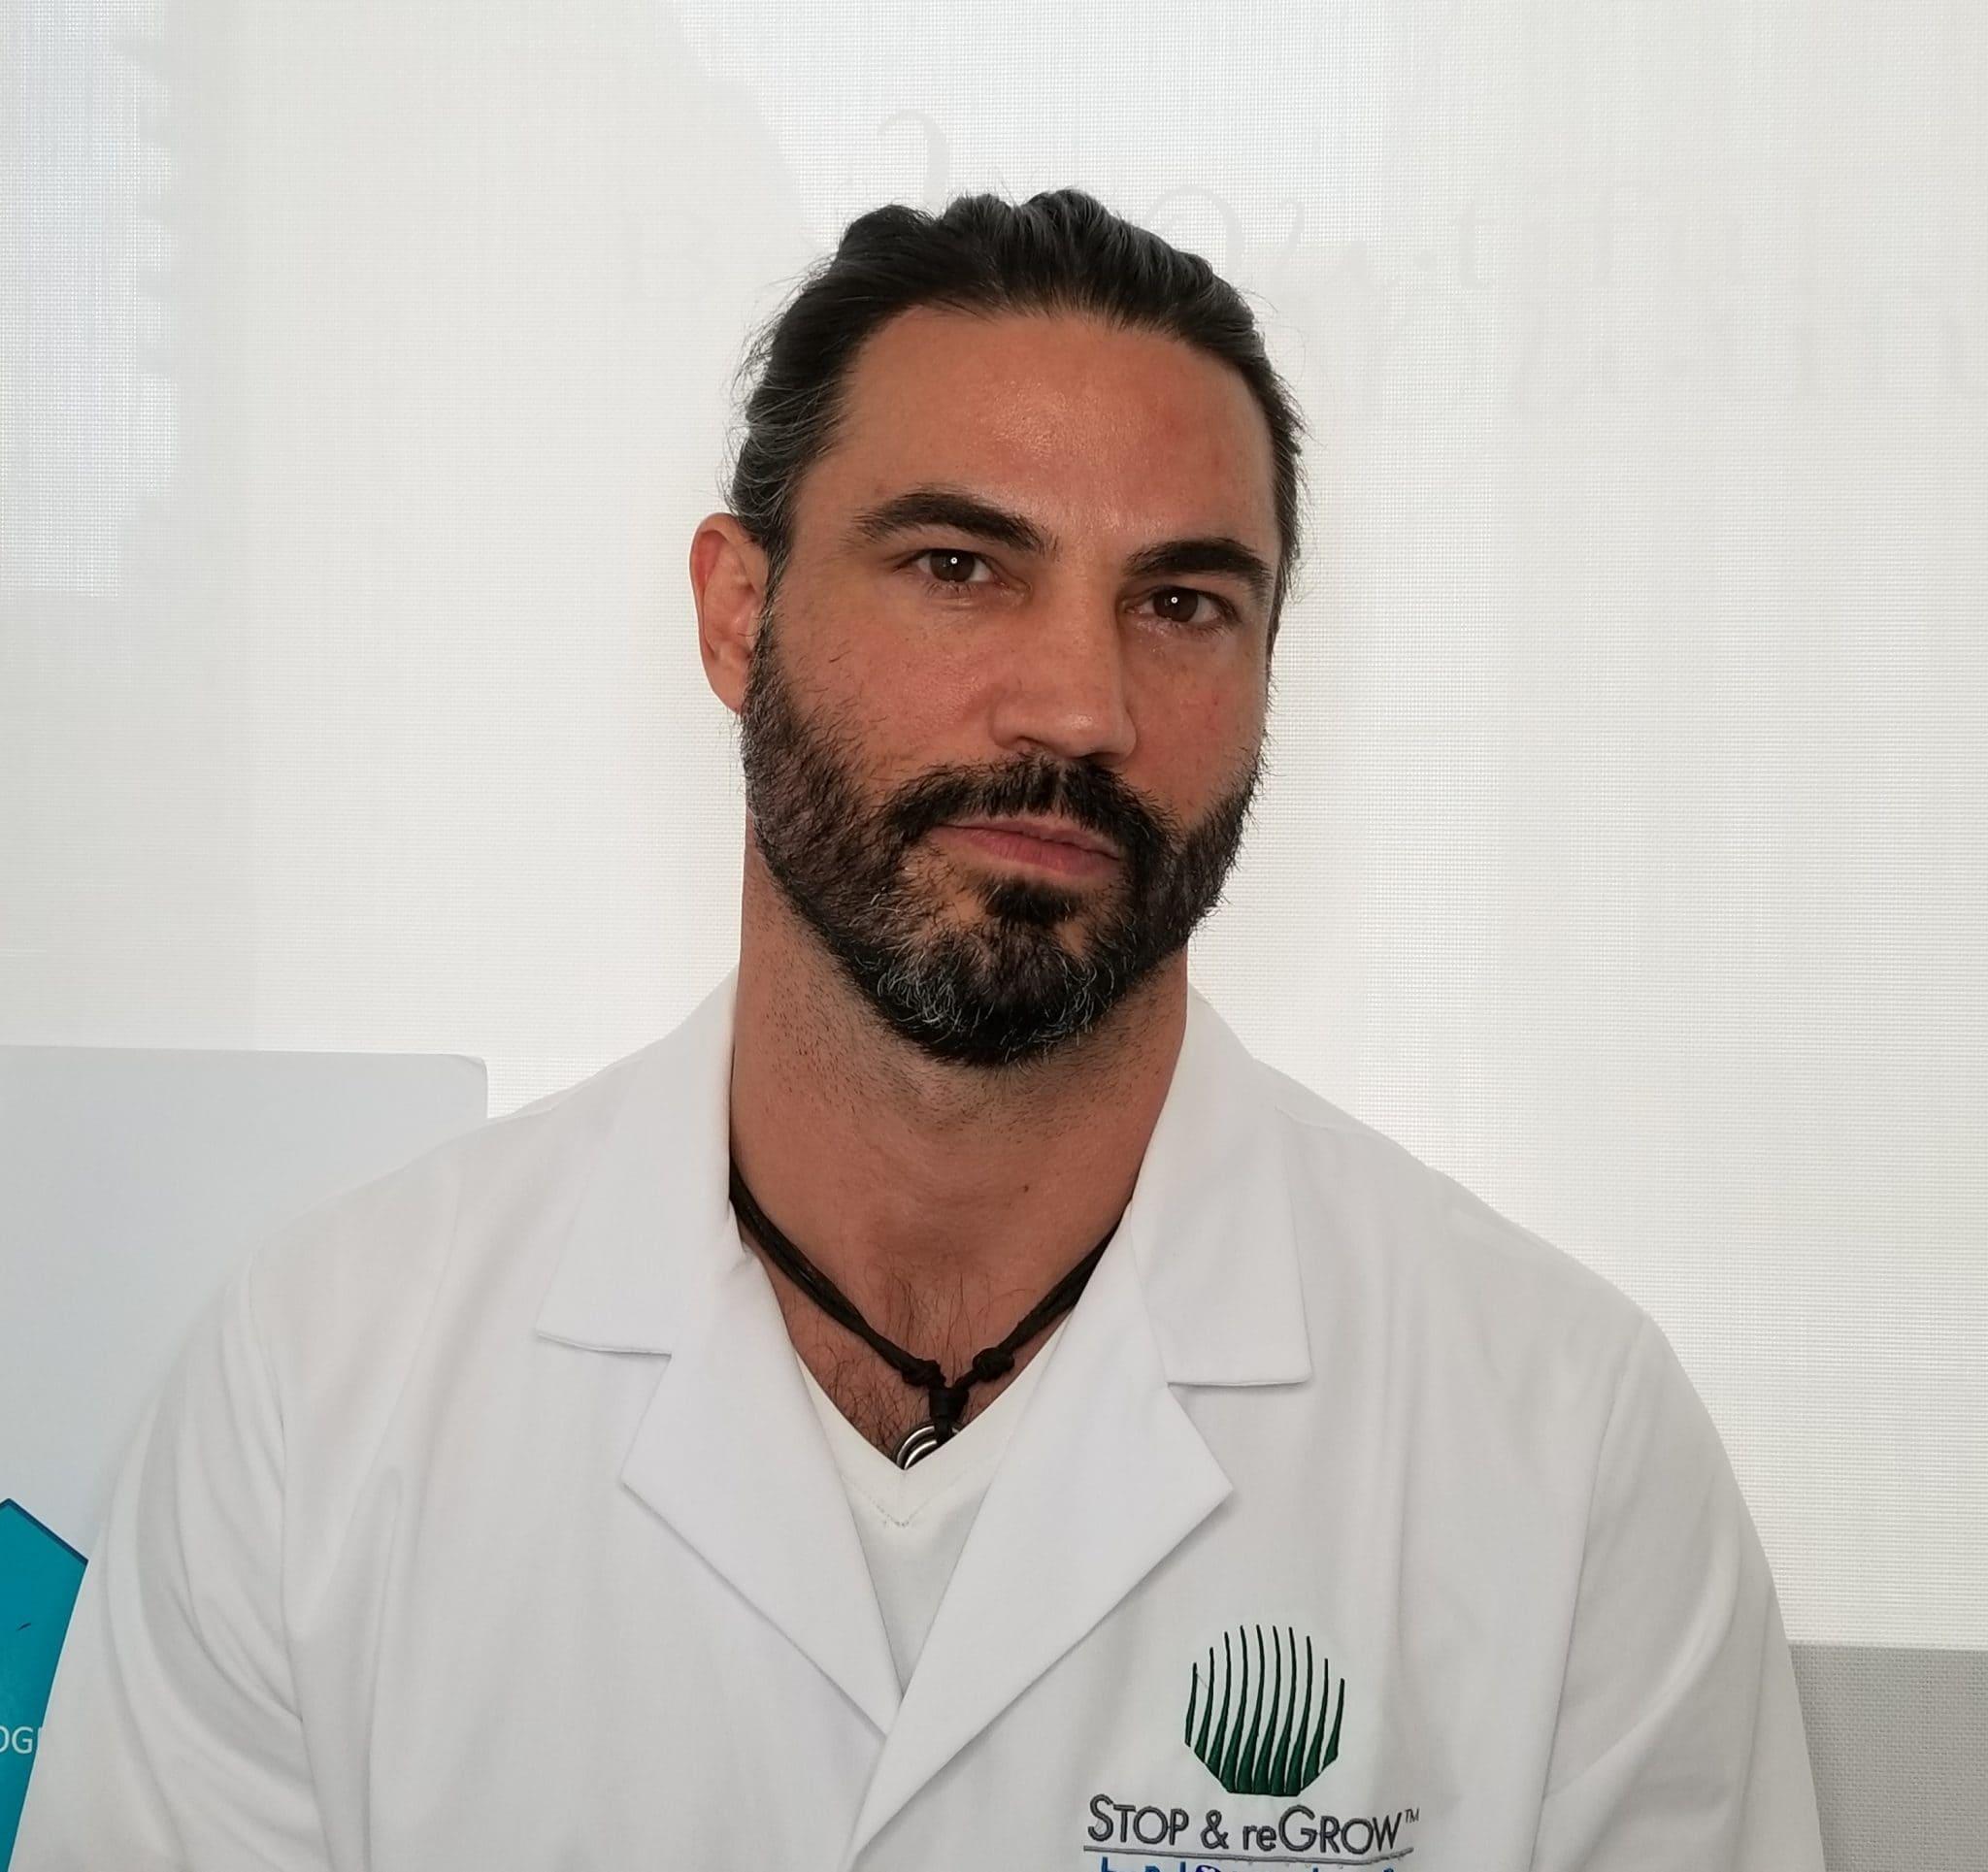 Dr. Robert Nettles